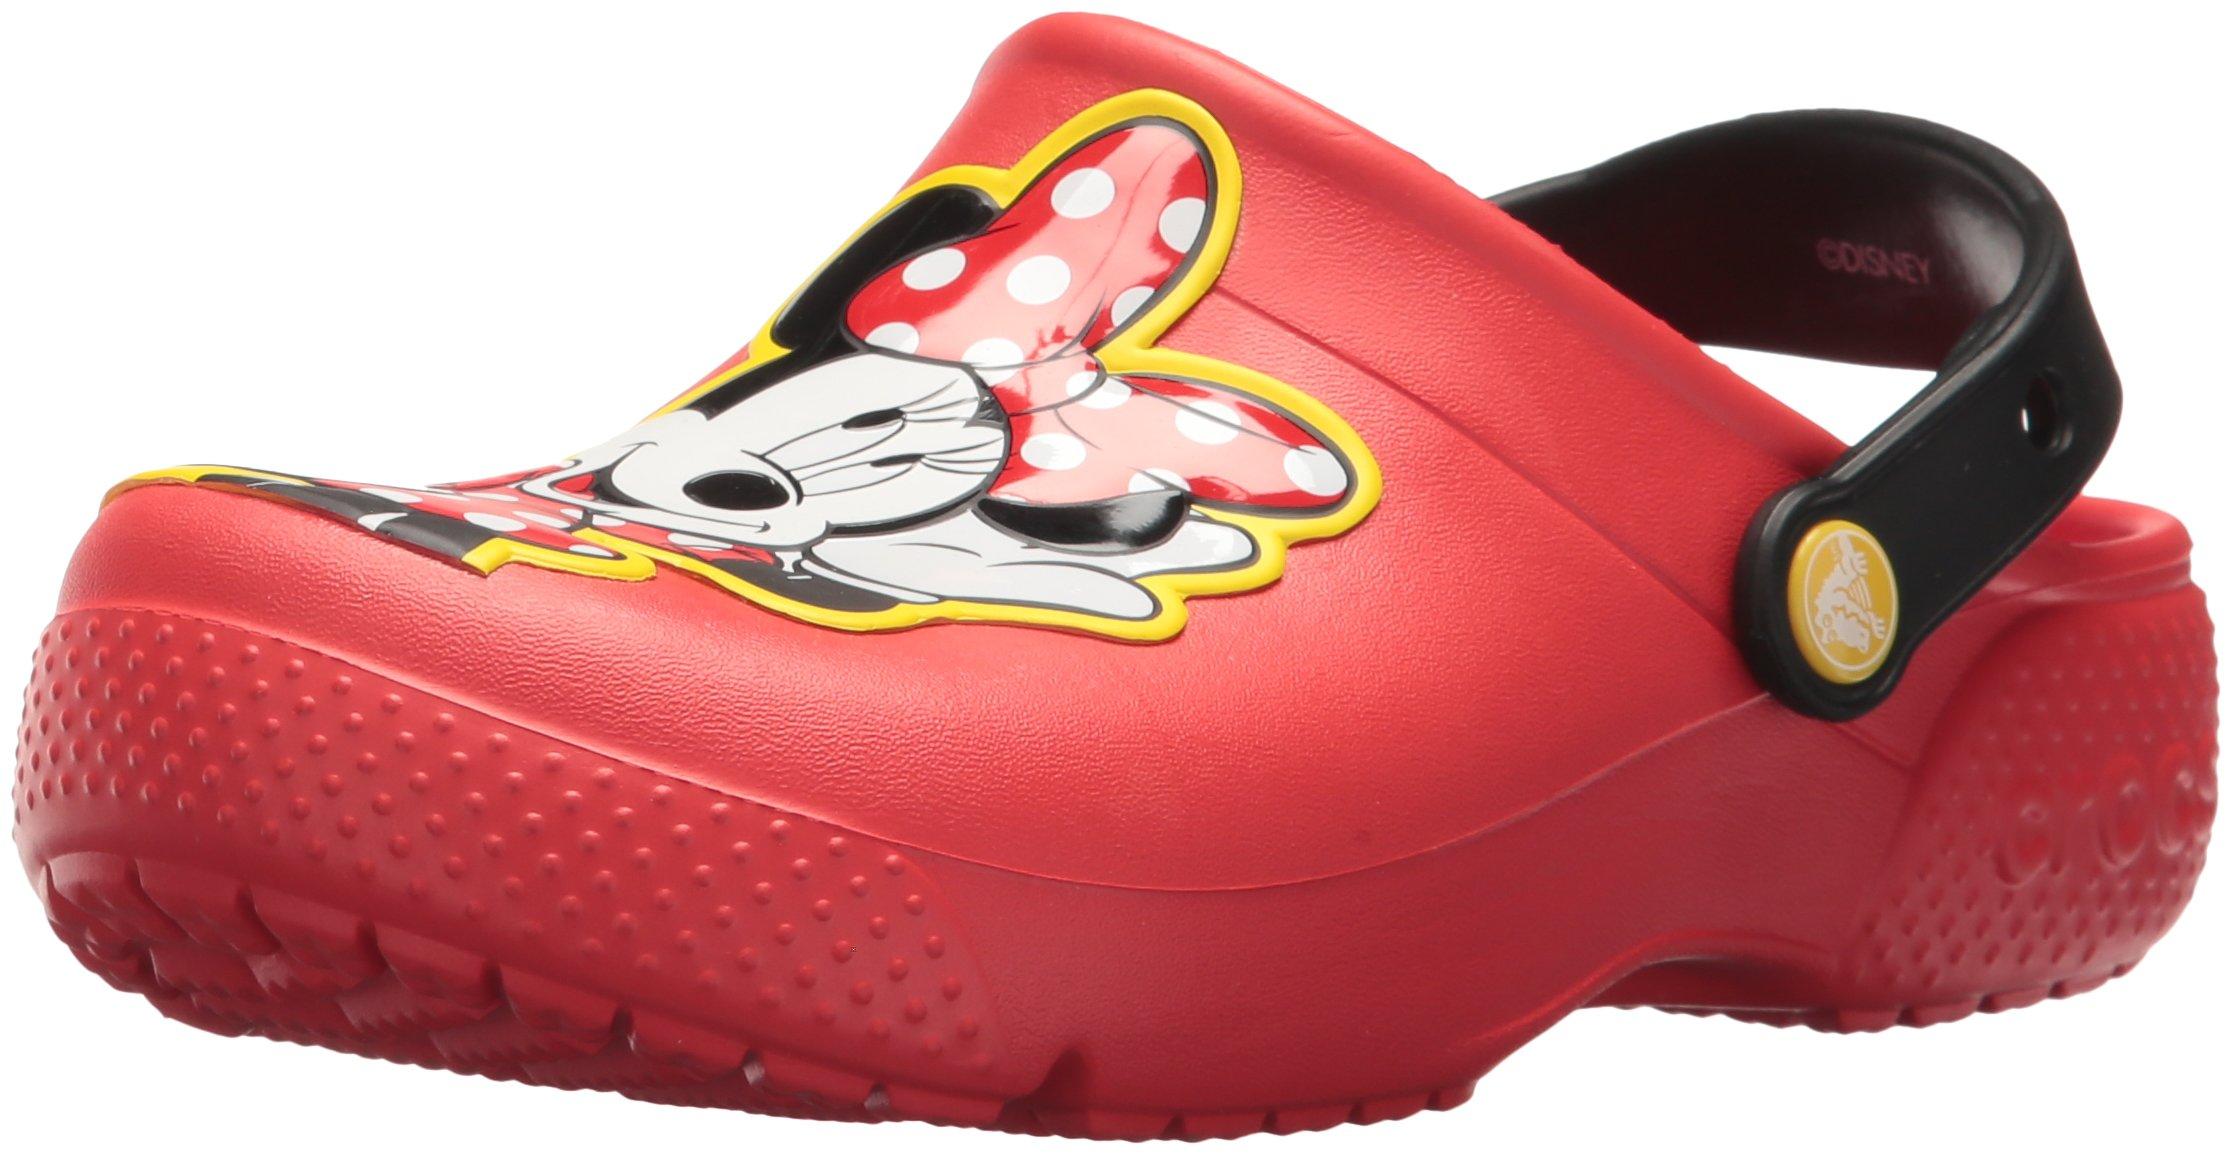 Crocs Girls' Fun Lab Minnie Clog, Flame, 6 M US Toddler